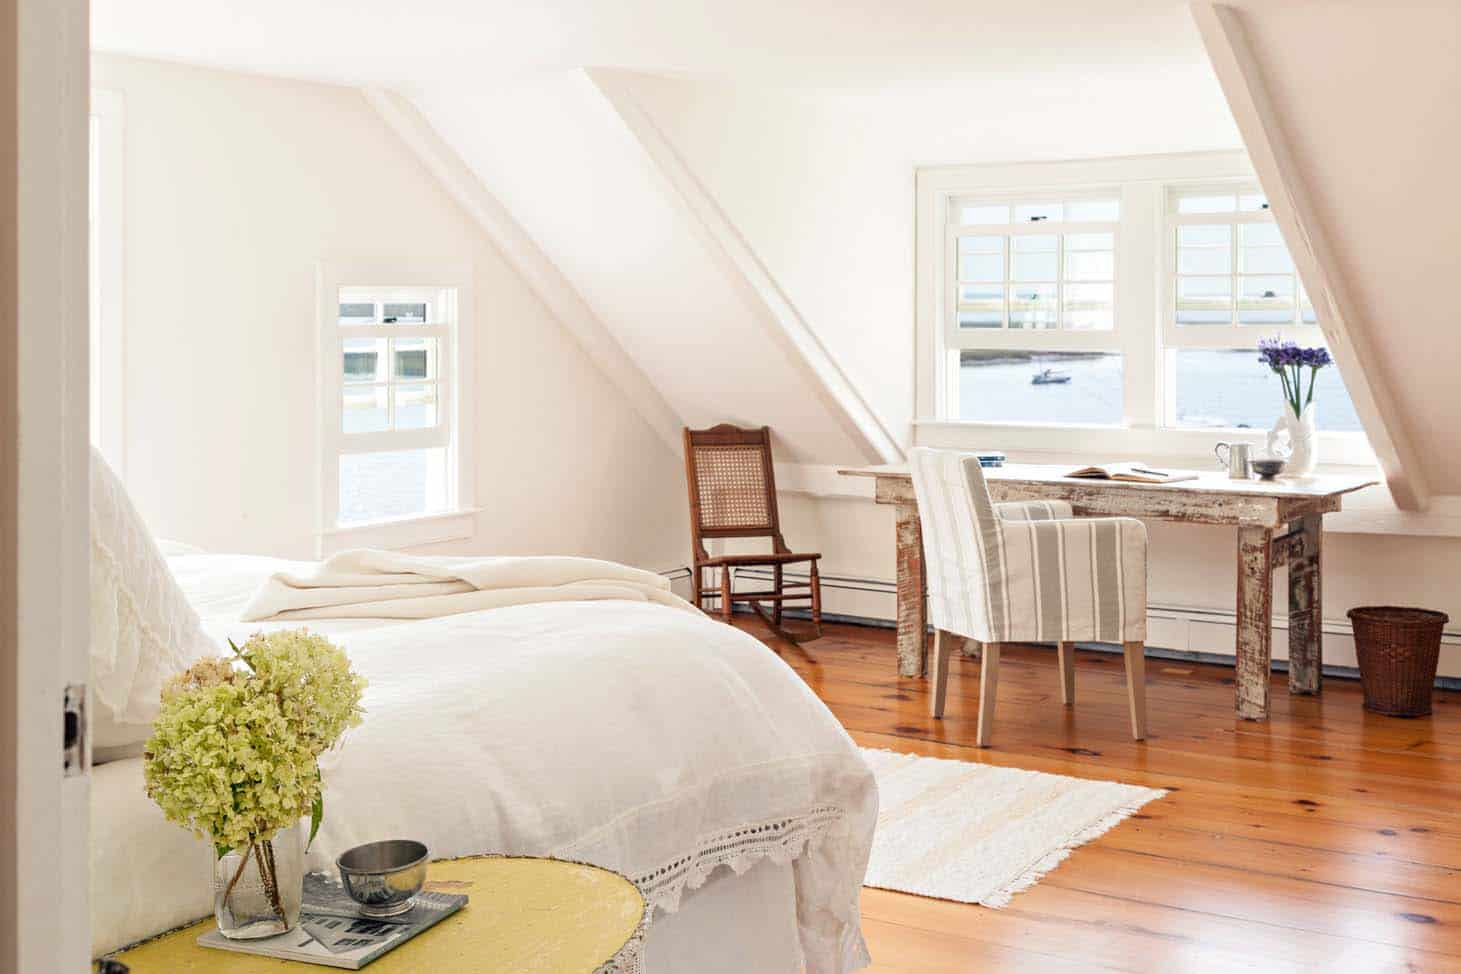 Cape Cod-Style Cottage Interiors-06-1 Kindesign.jpg